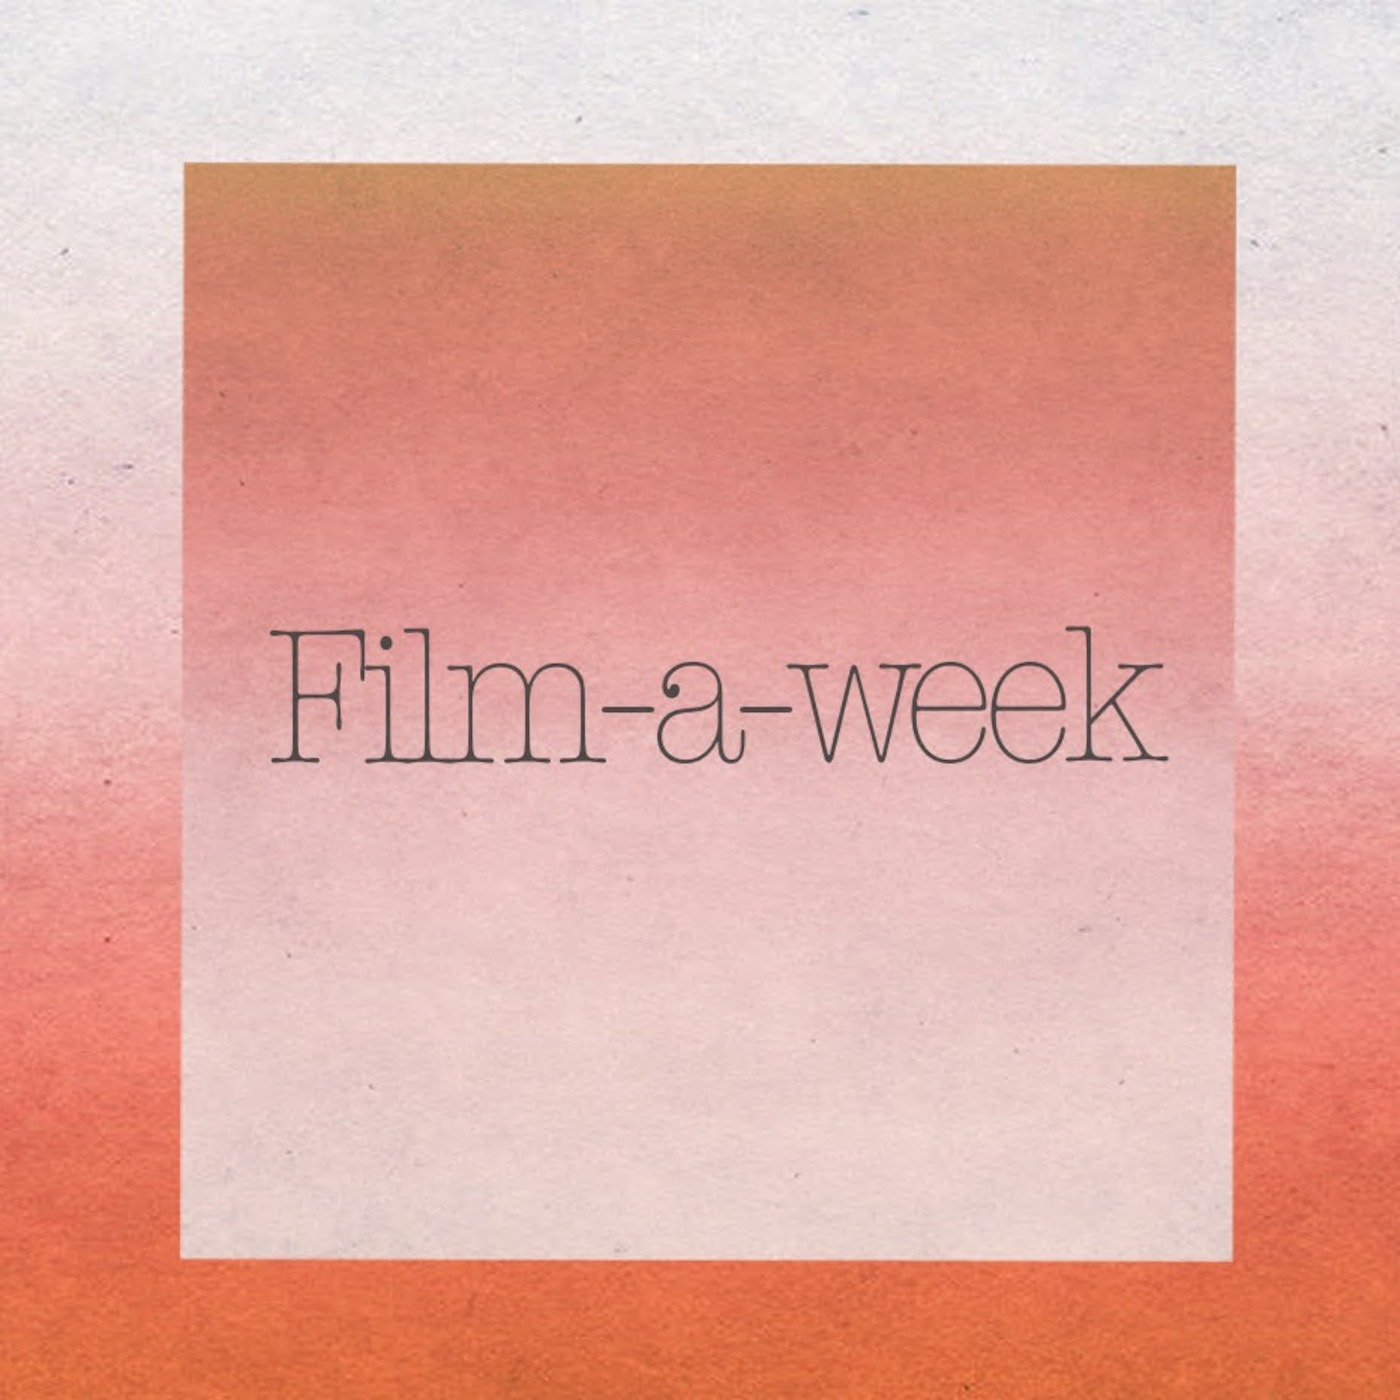 Film-a-Week